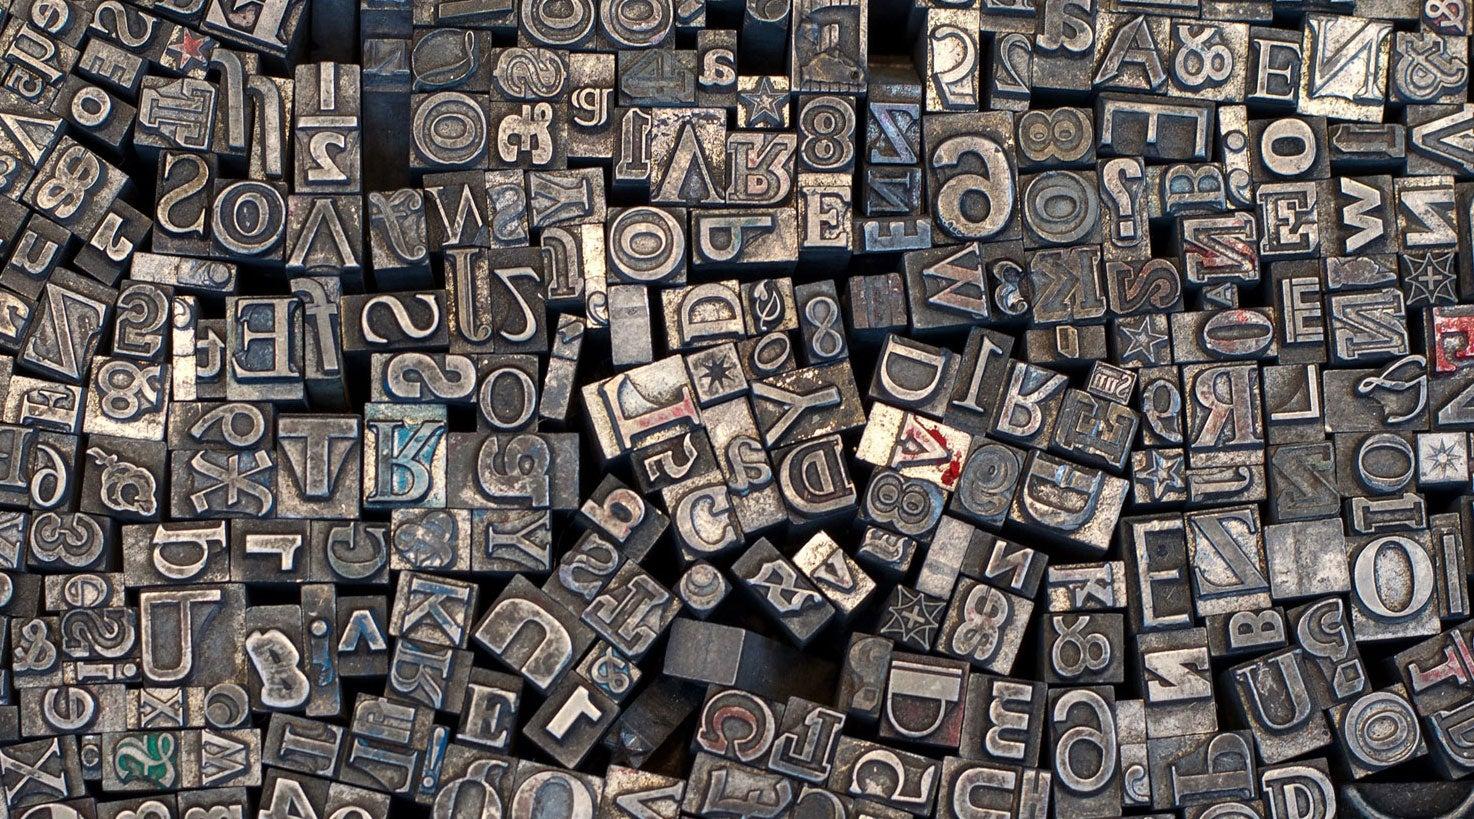 Typewriter keys scattered.